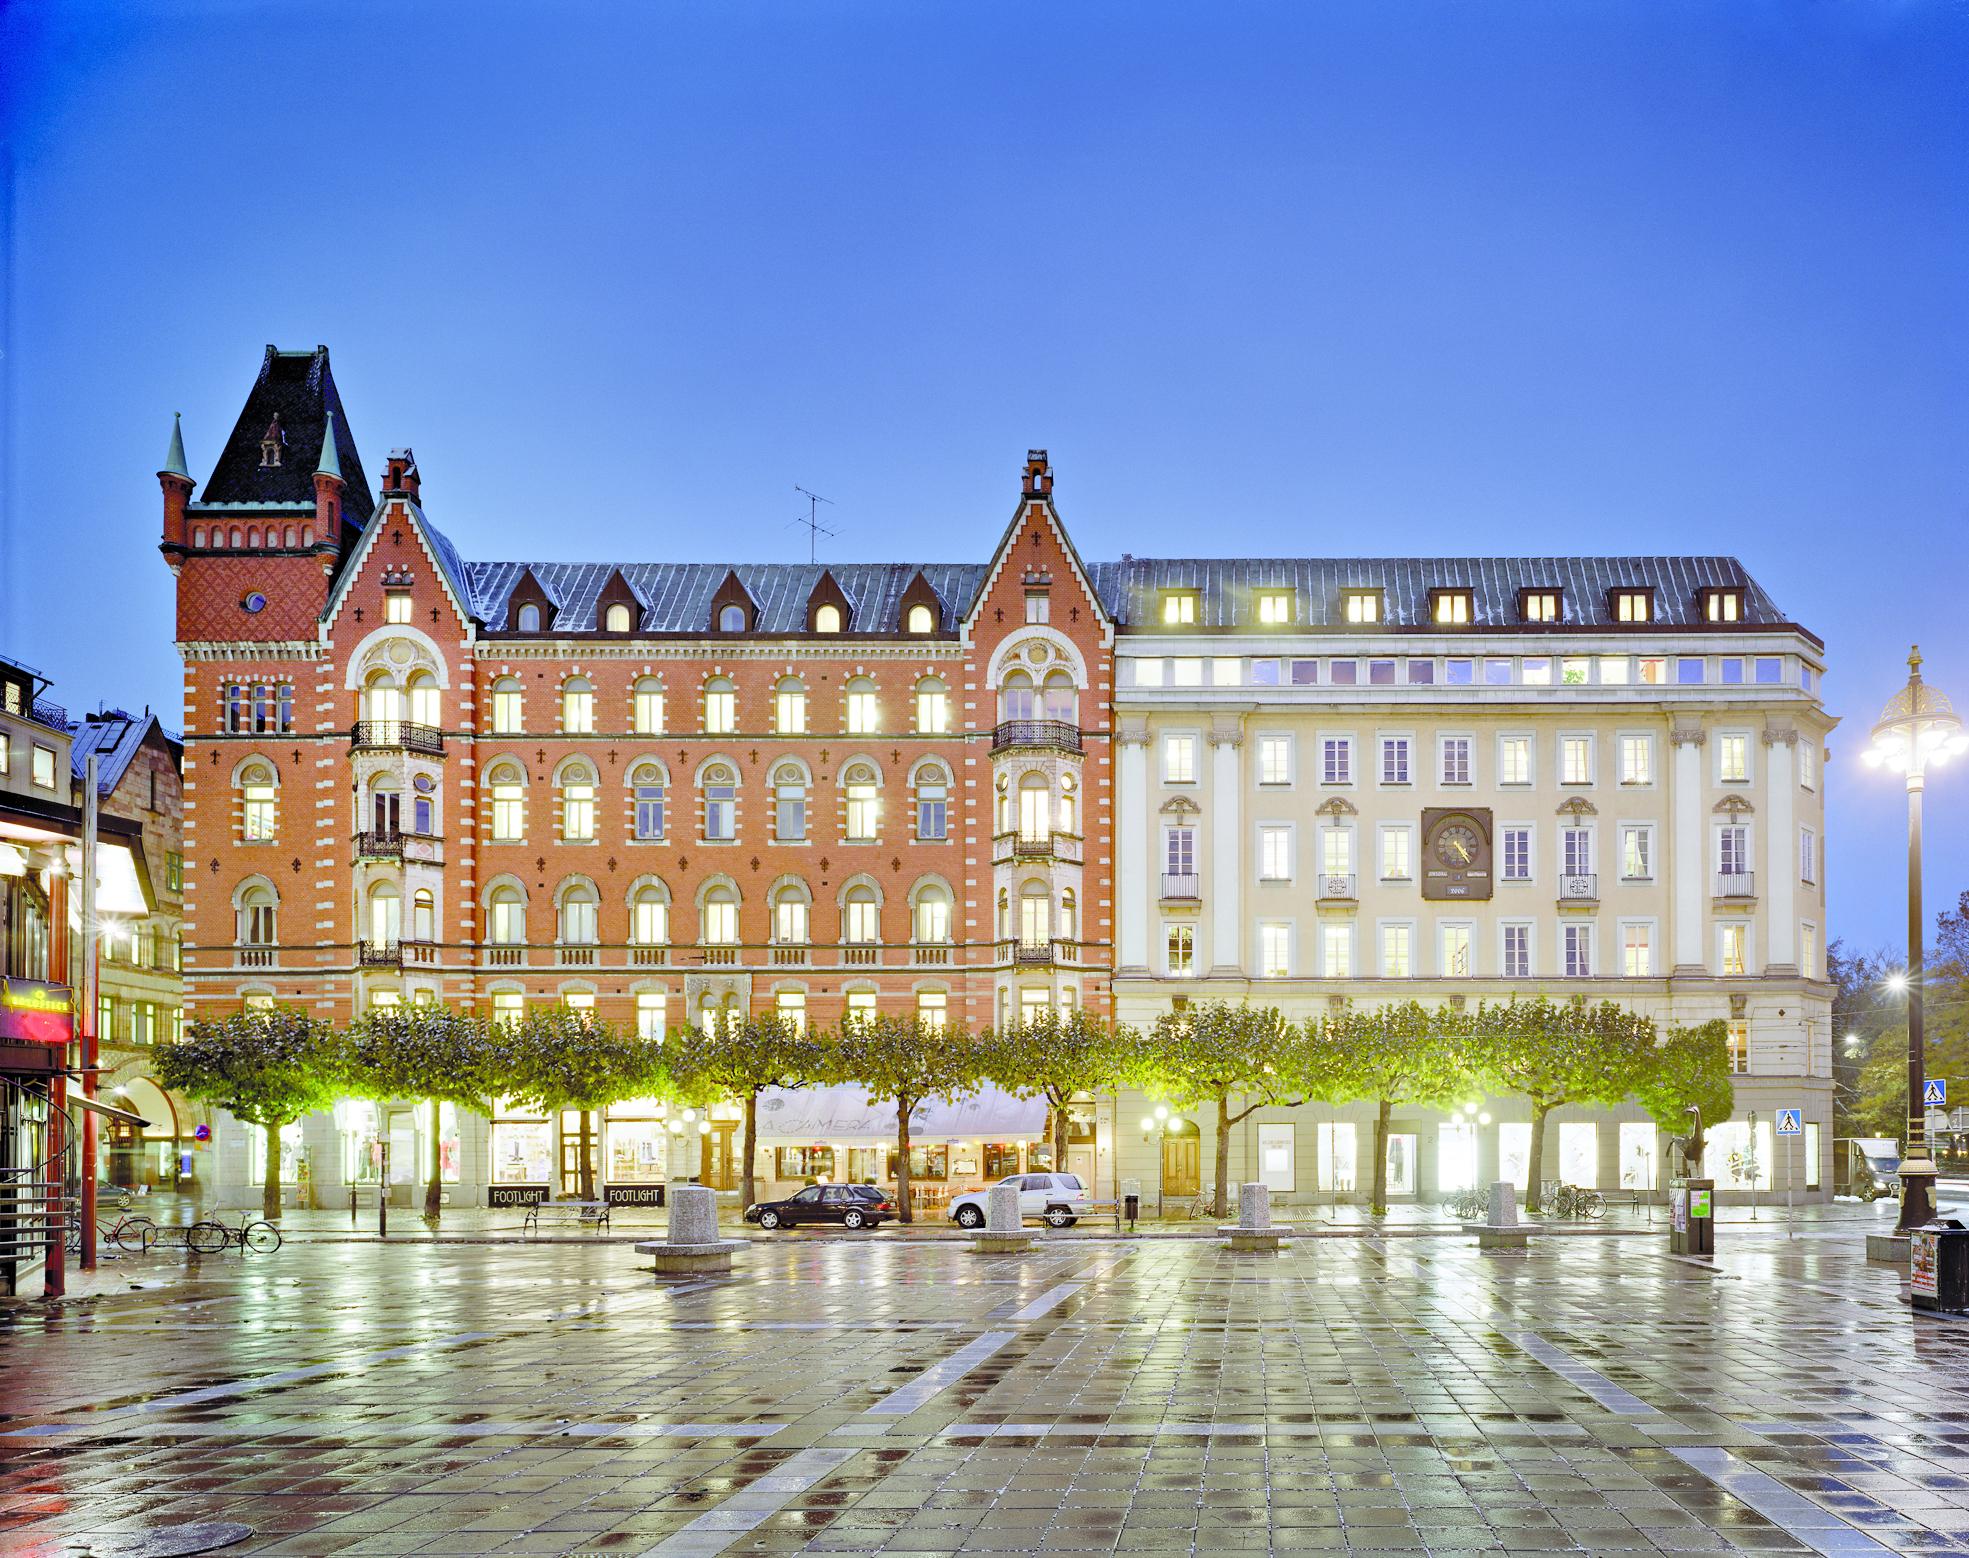 Nobis hotell